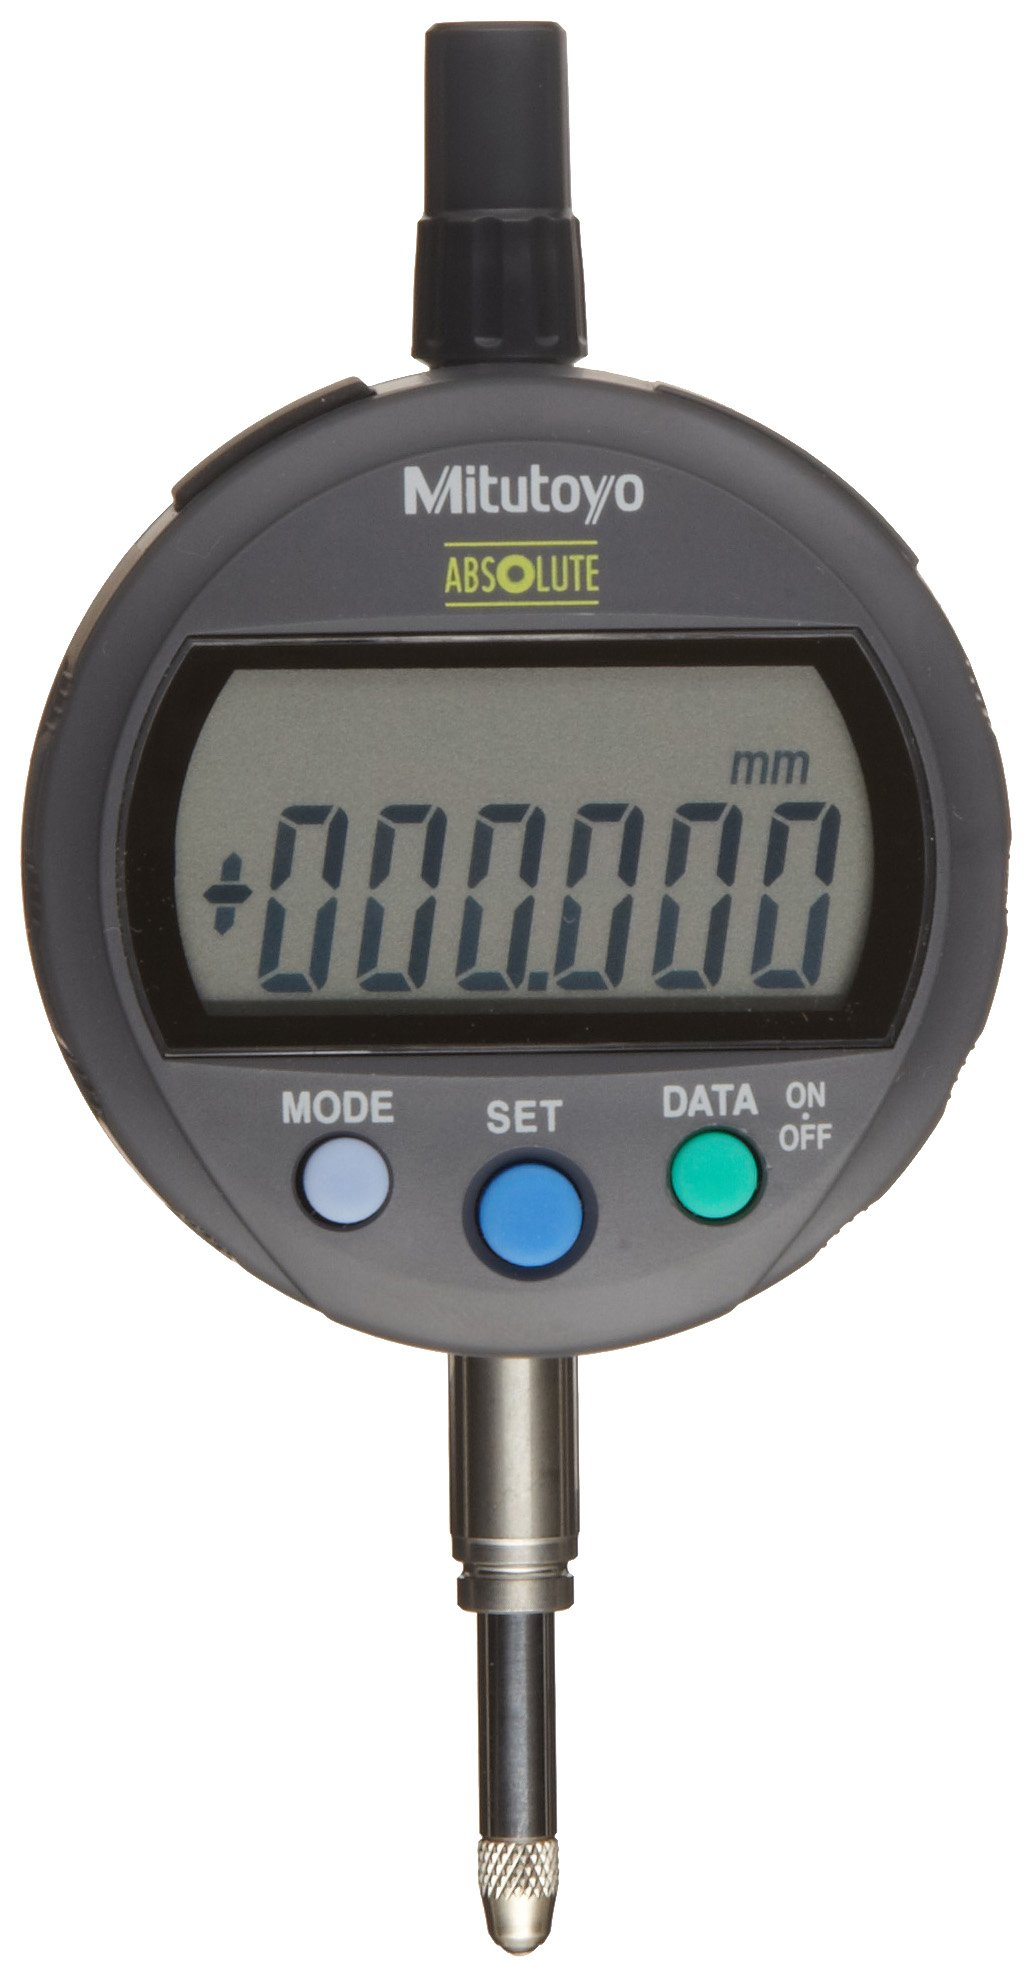 Mitutoyo 543-390 Absolute LCD Digimatic Indicator ID-C, Standard Type, M2.5X0.45 Thread, 8mm Stem Dia., Lug Back, 0-12.7mm Range, 0.001mm Graduation, +/-0.003mm Accuracy